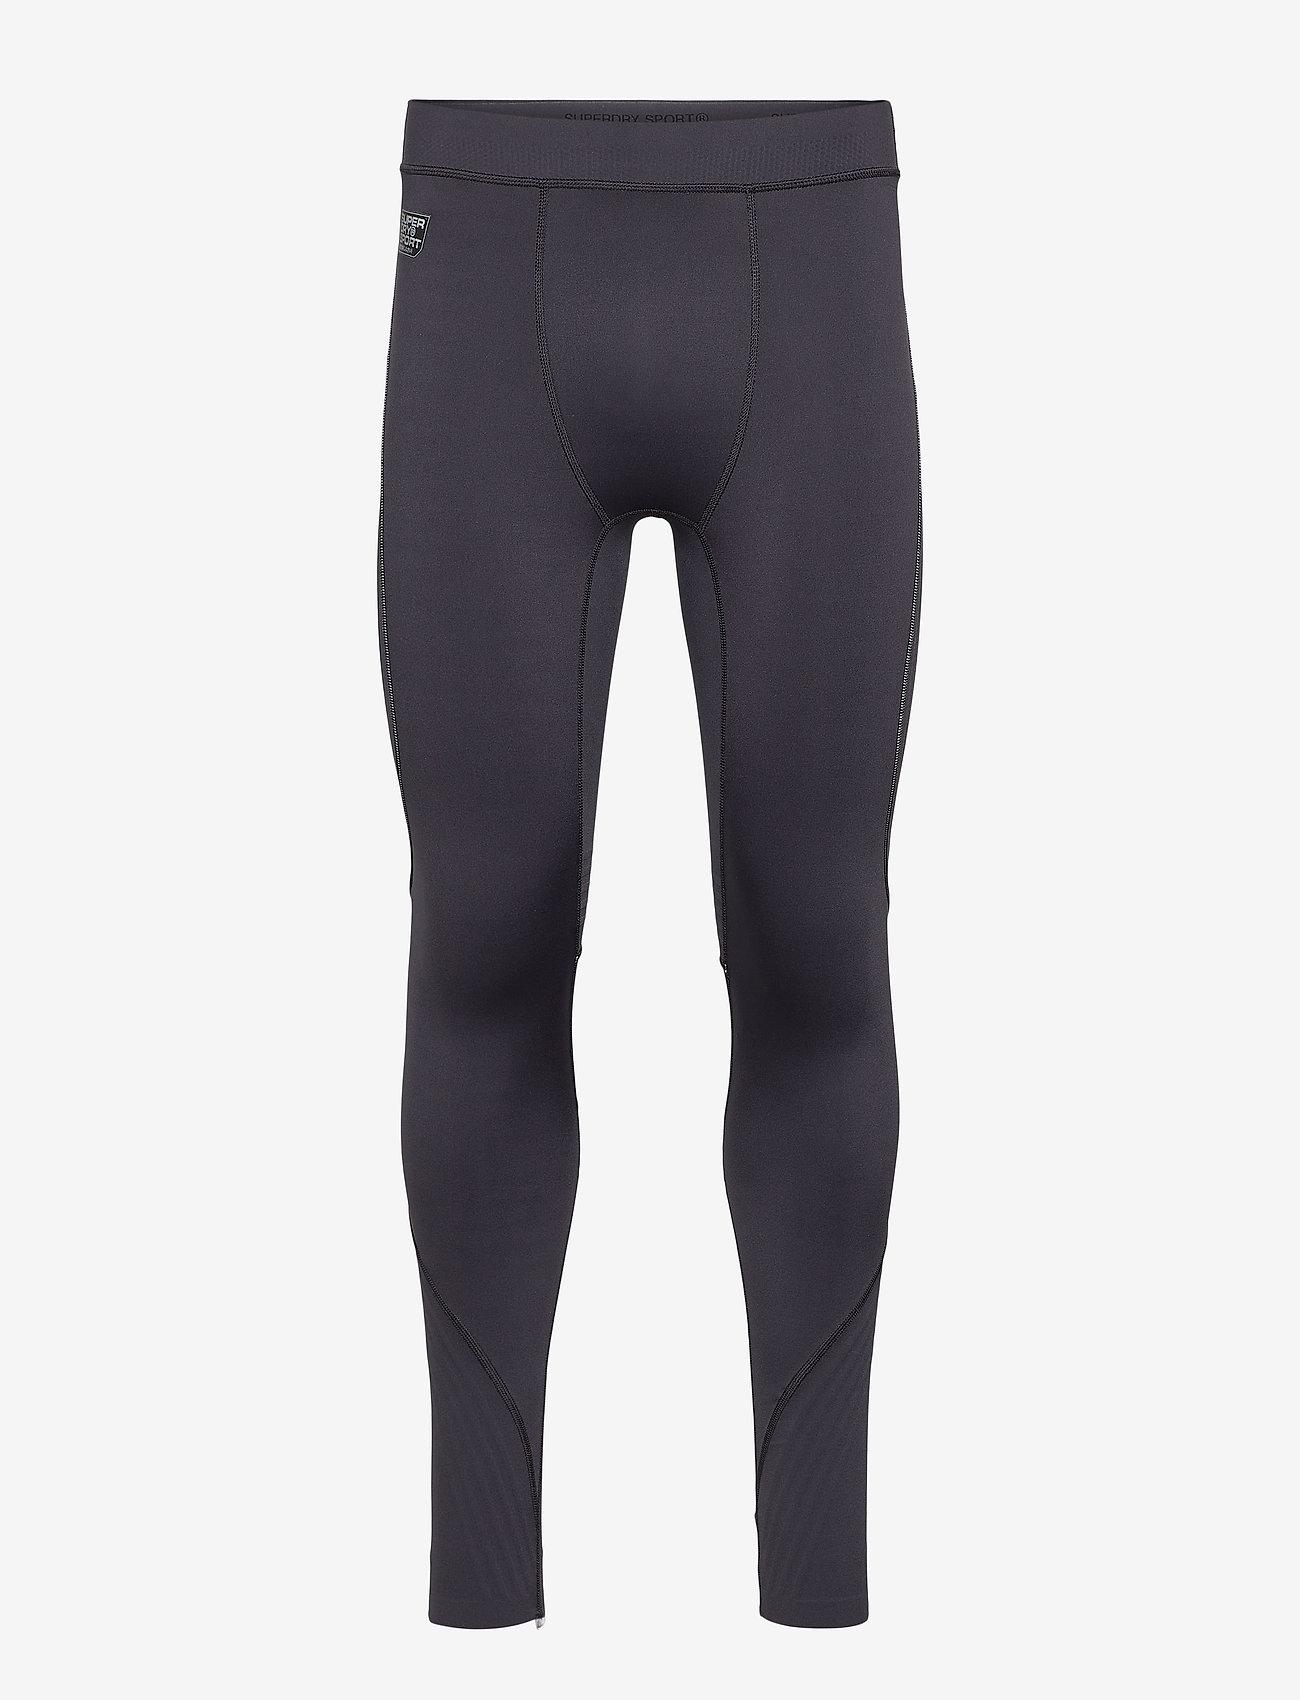 Superdry - PERFORMANCE FLOCK COMPRESSION LEGGING - spodnie treningowe - black - 0